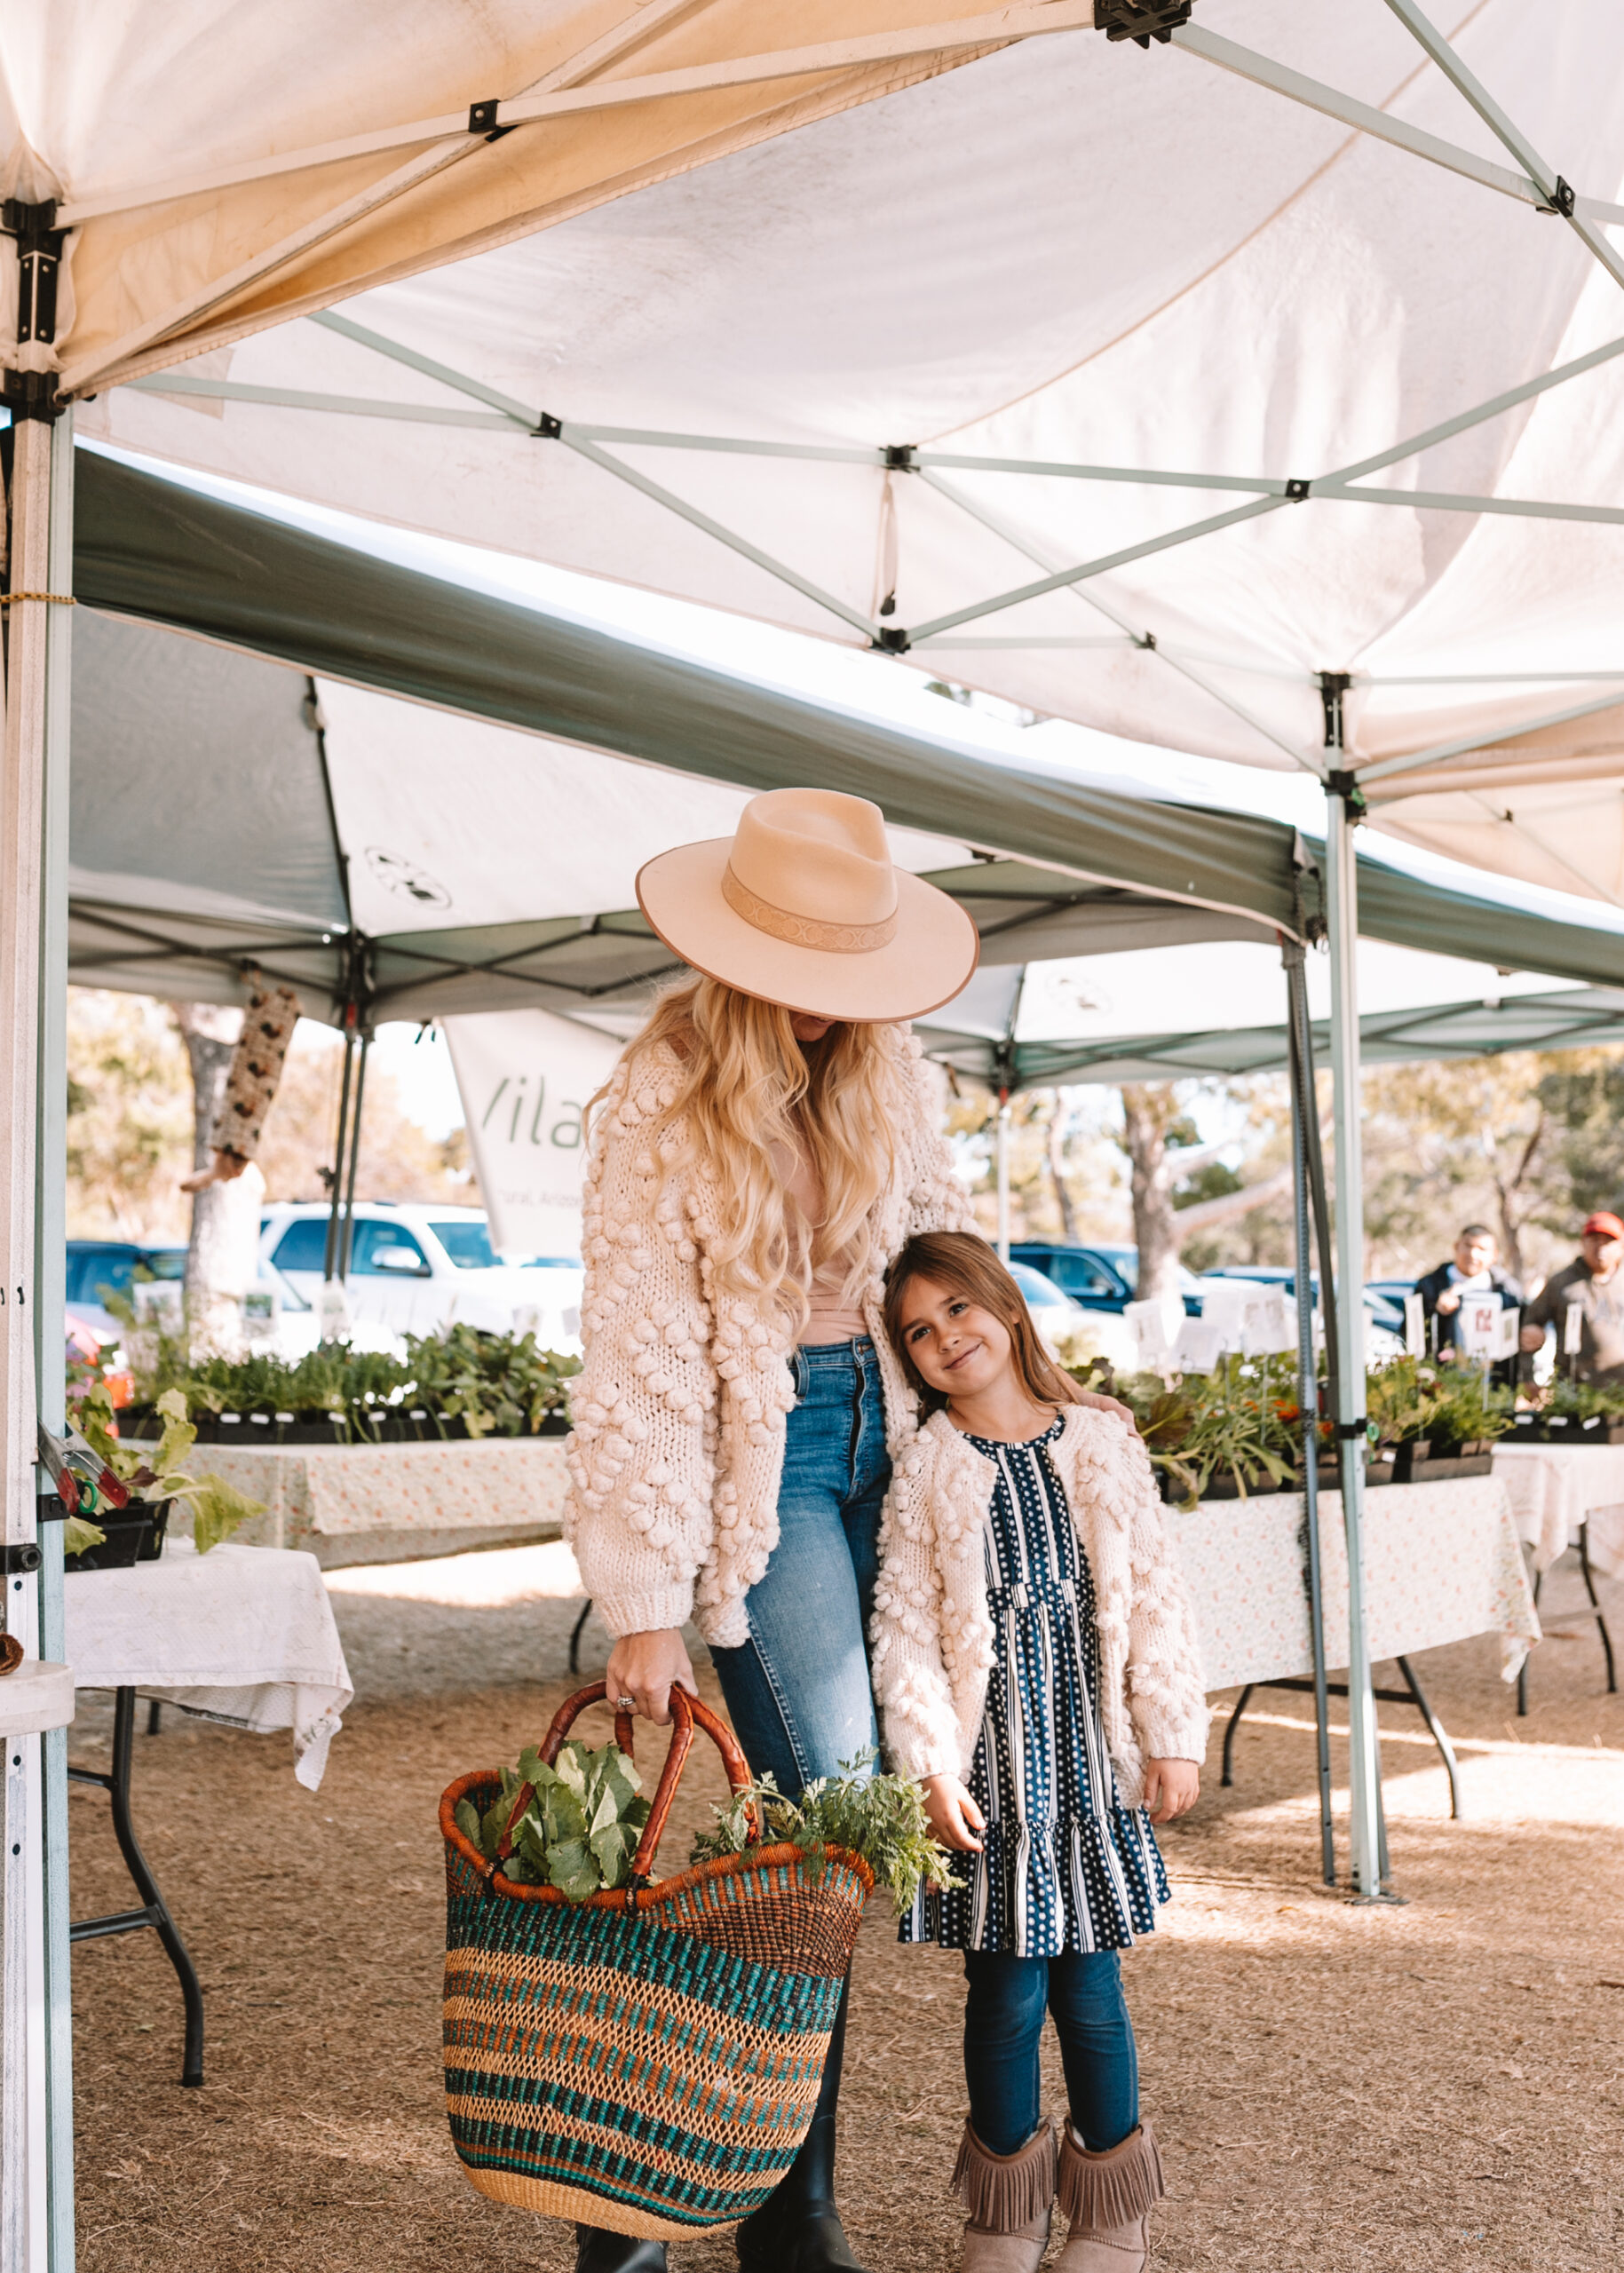 farmers market finds in arizona #thelovedesignedlife #farmersmarket #arizonafarmersmarket #springfuninarizona